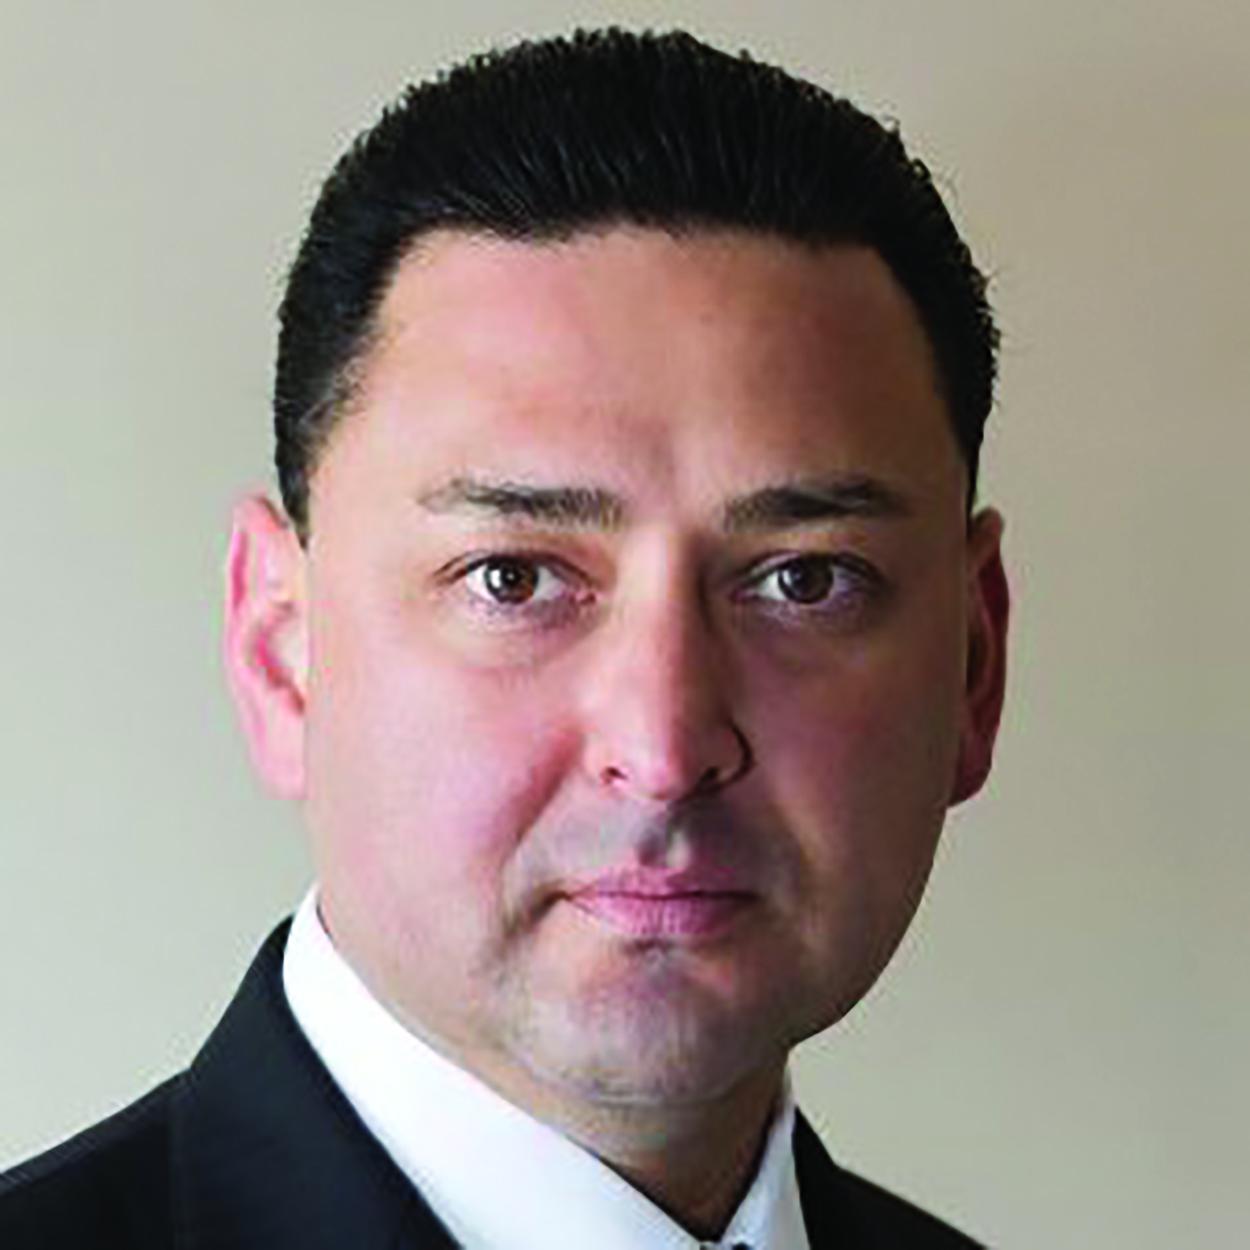 Hector Padilla